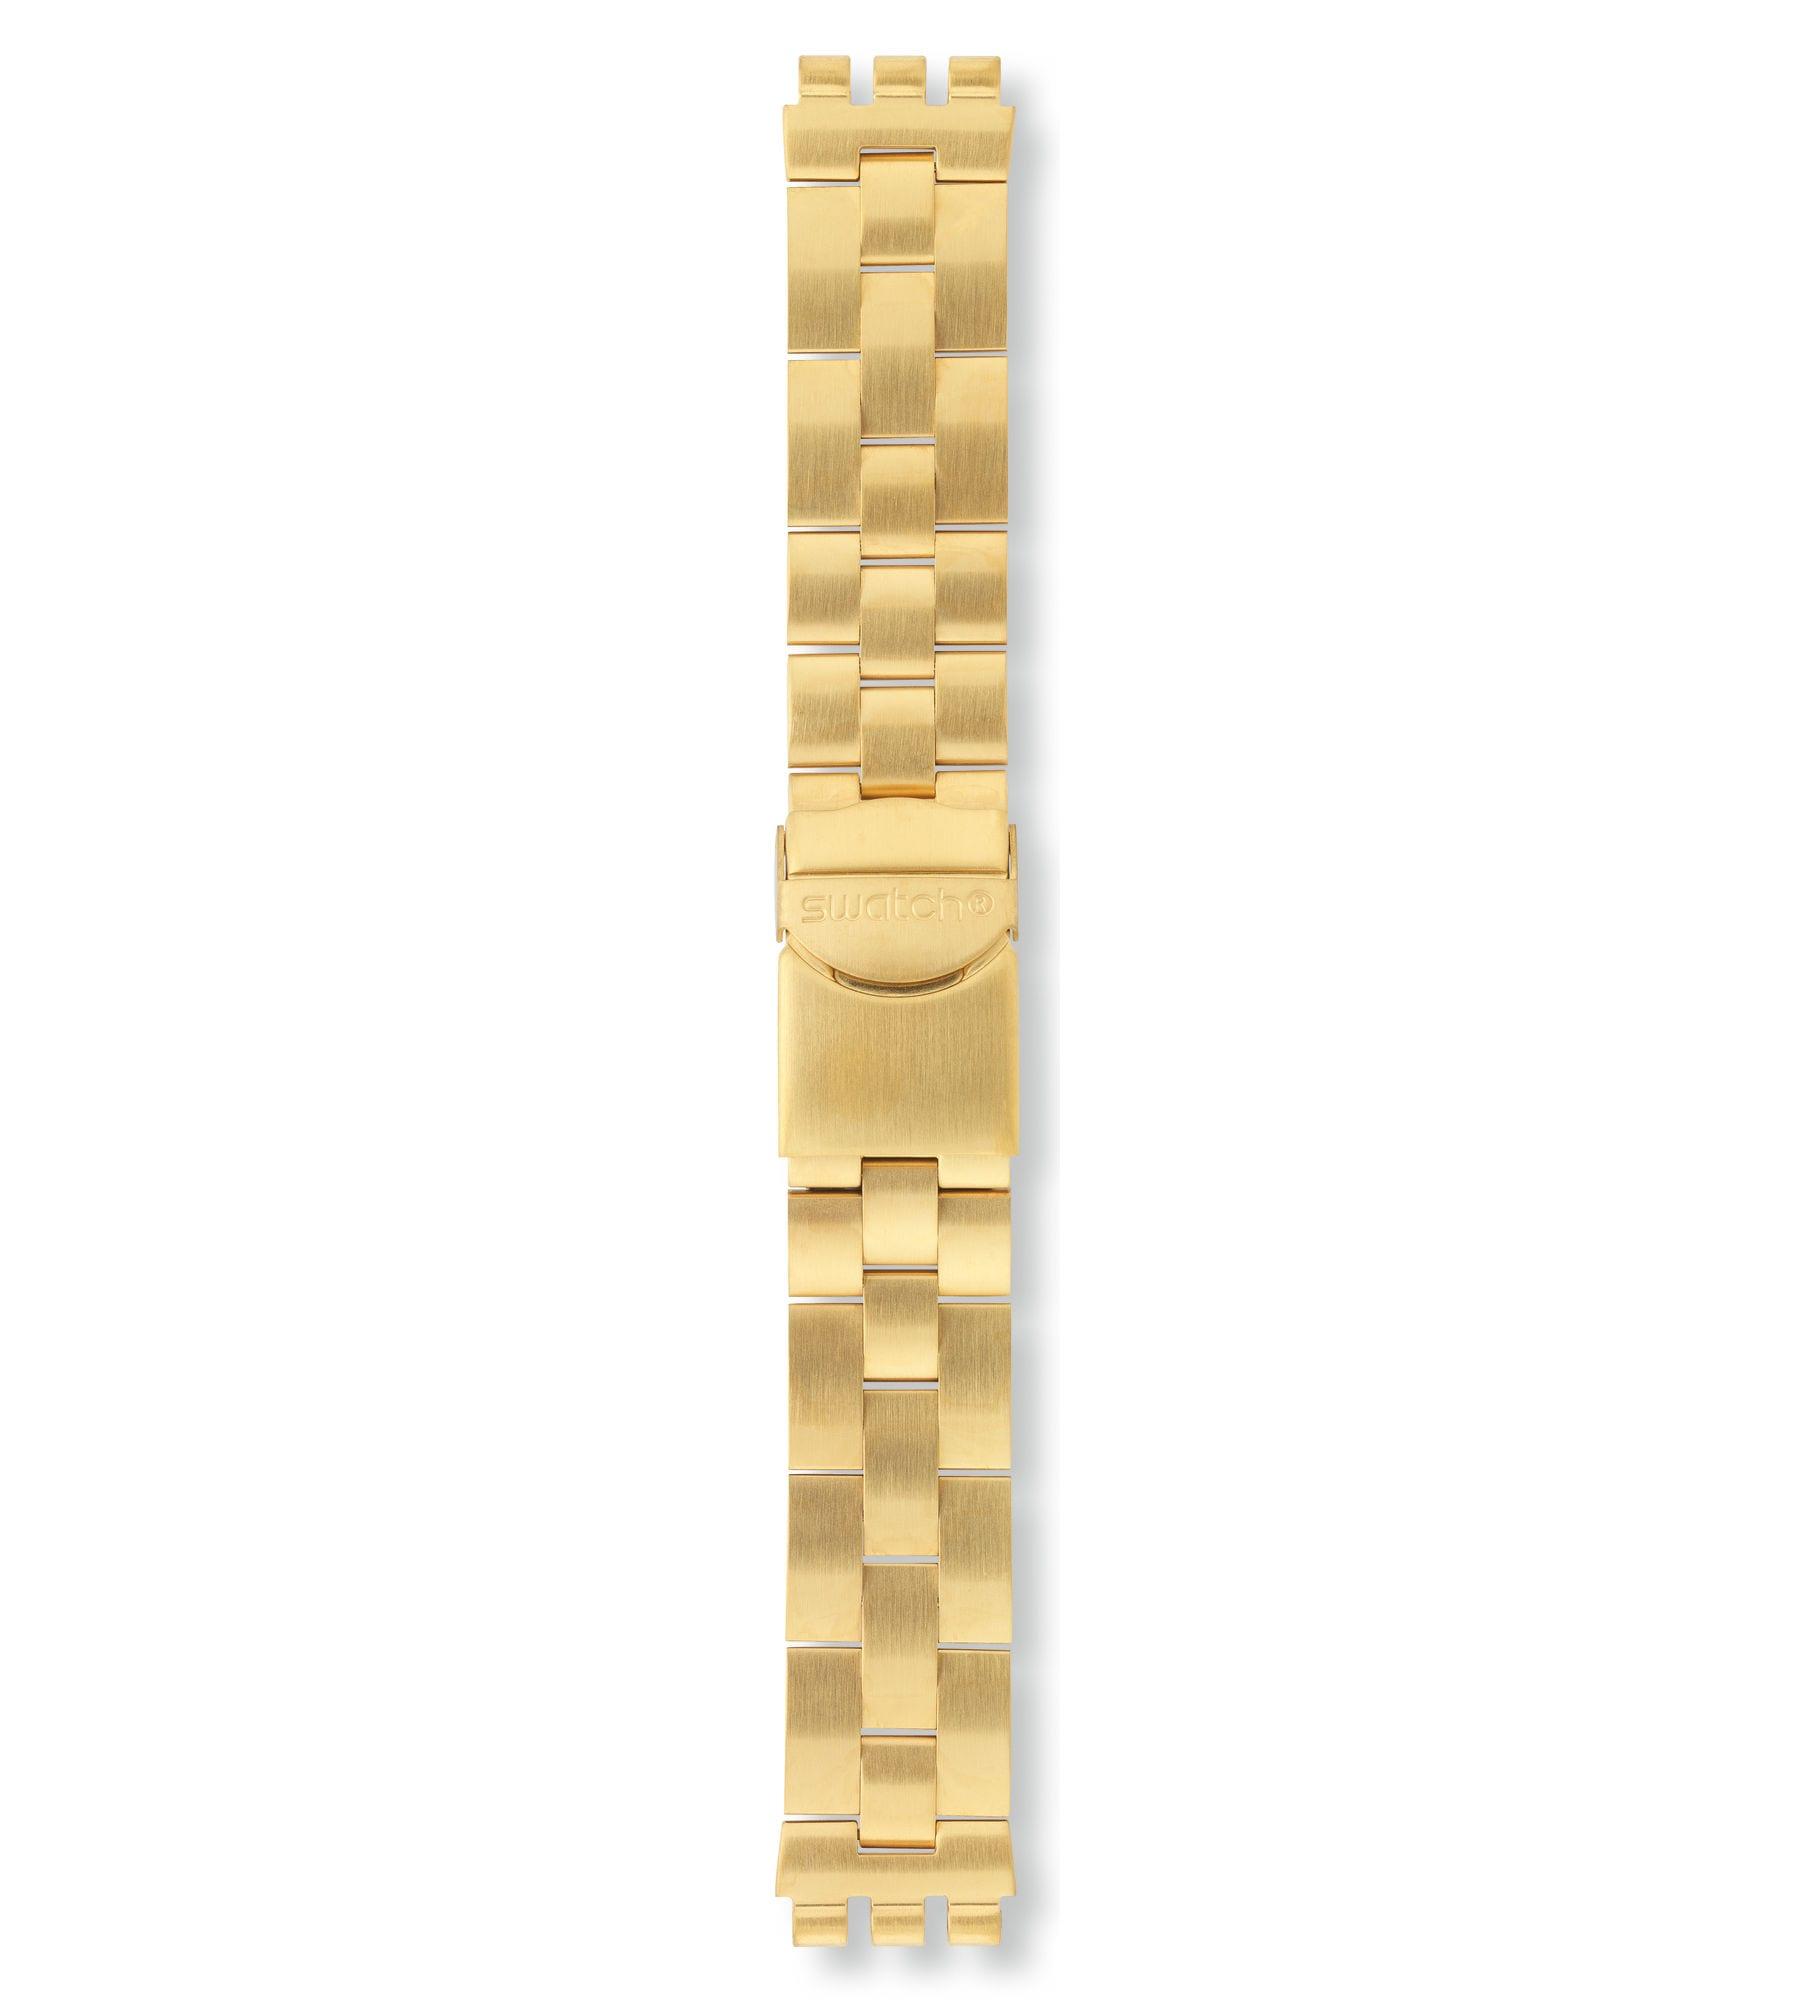 c60ea748741 Swatch® Portugal - Irony Chrono SHAQ 34 GOLD   ST.STEEL PVD ADJ ...